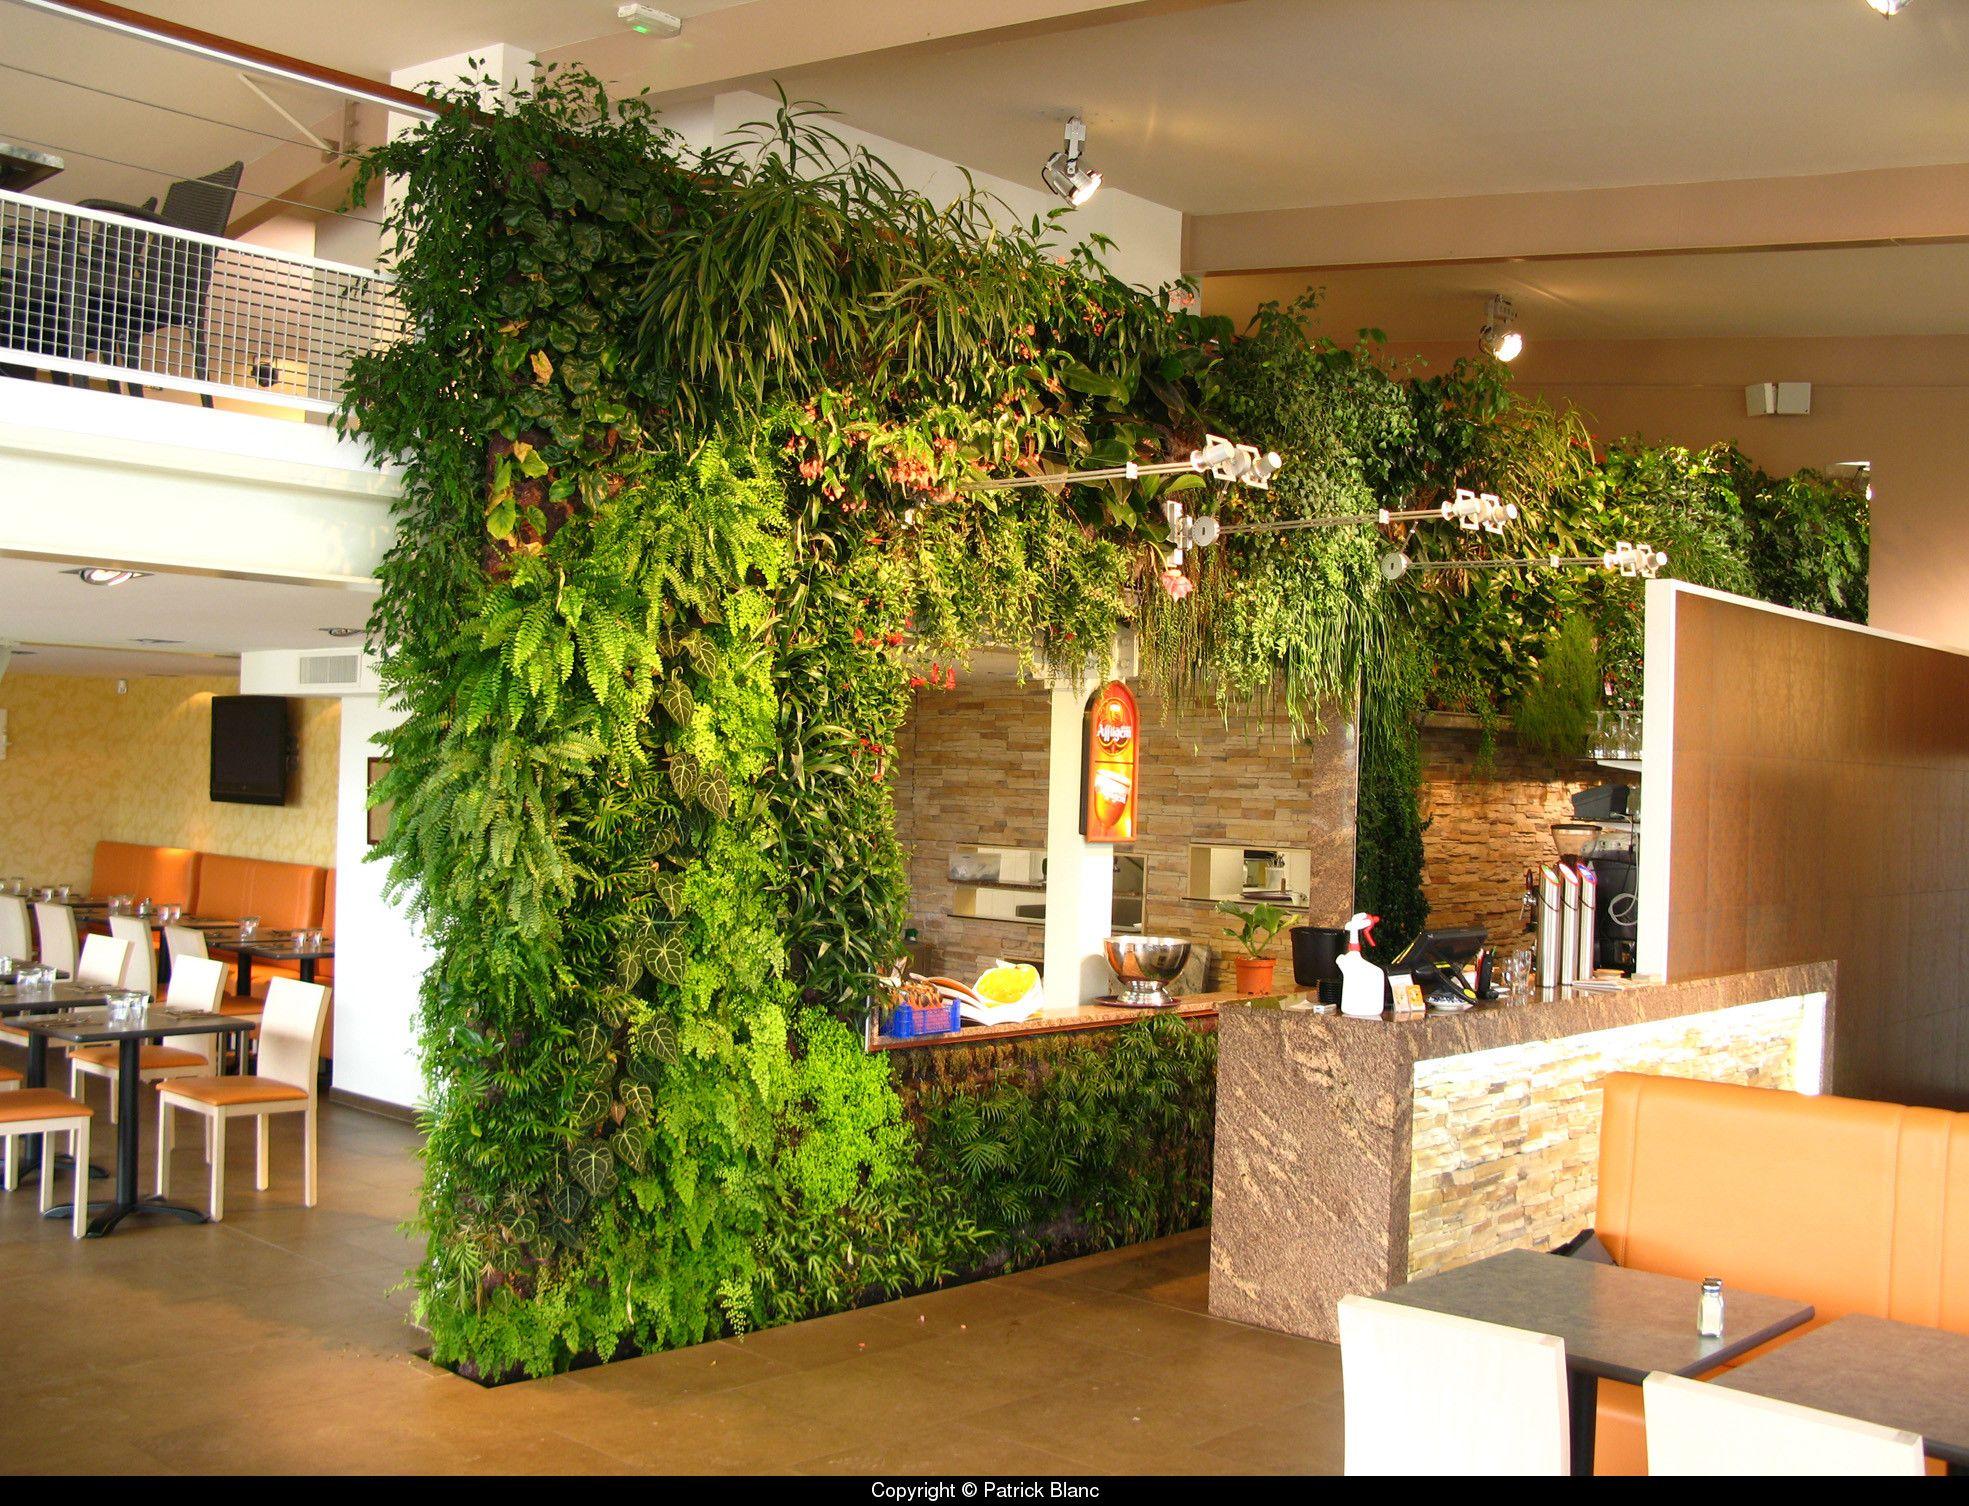 Vertical garden in restaurant Jardins potagers verticaux